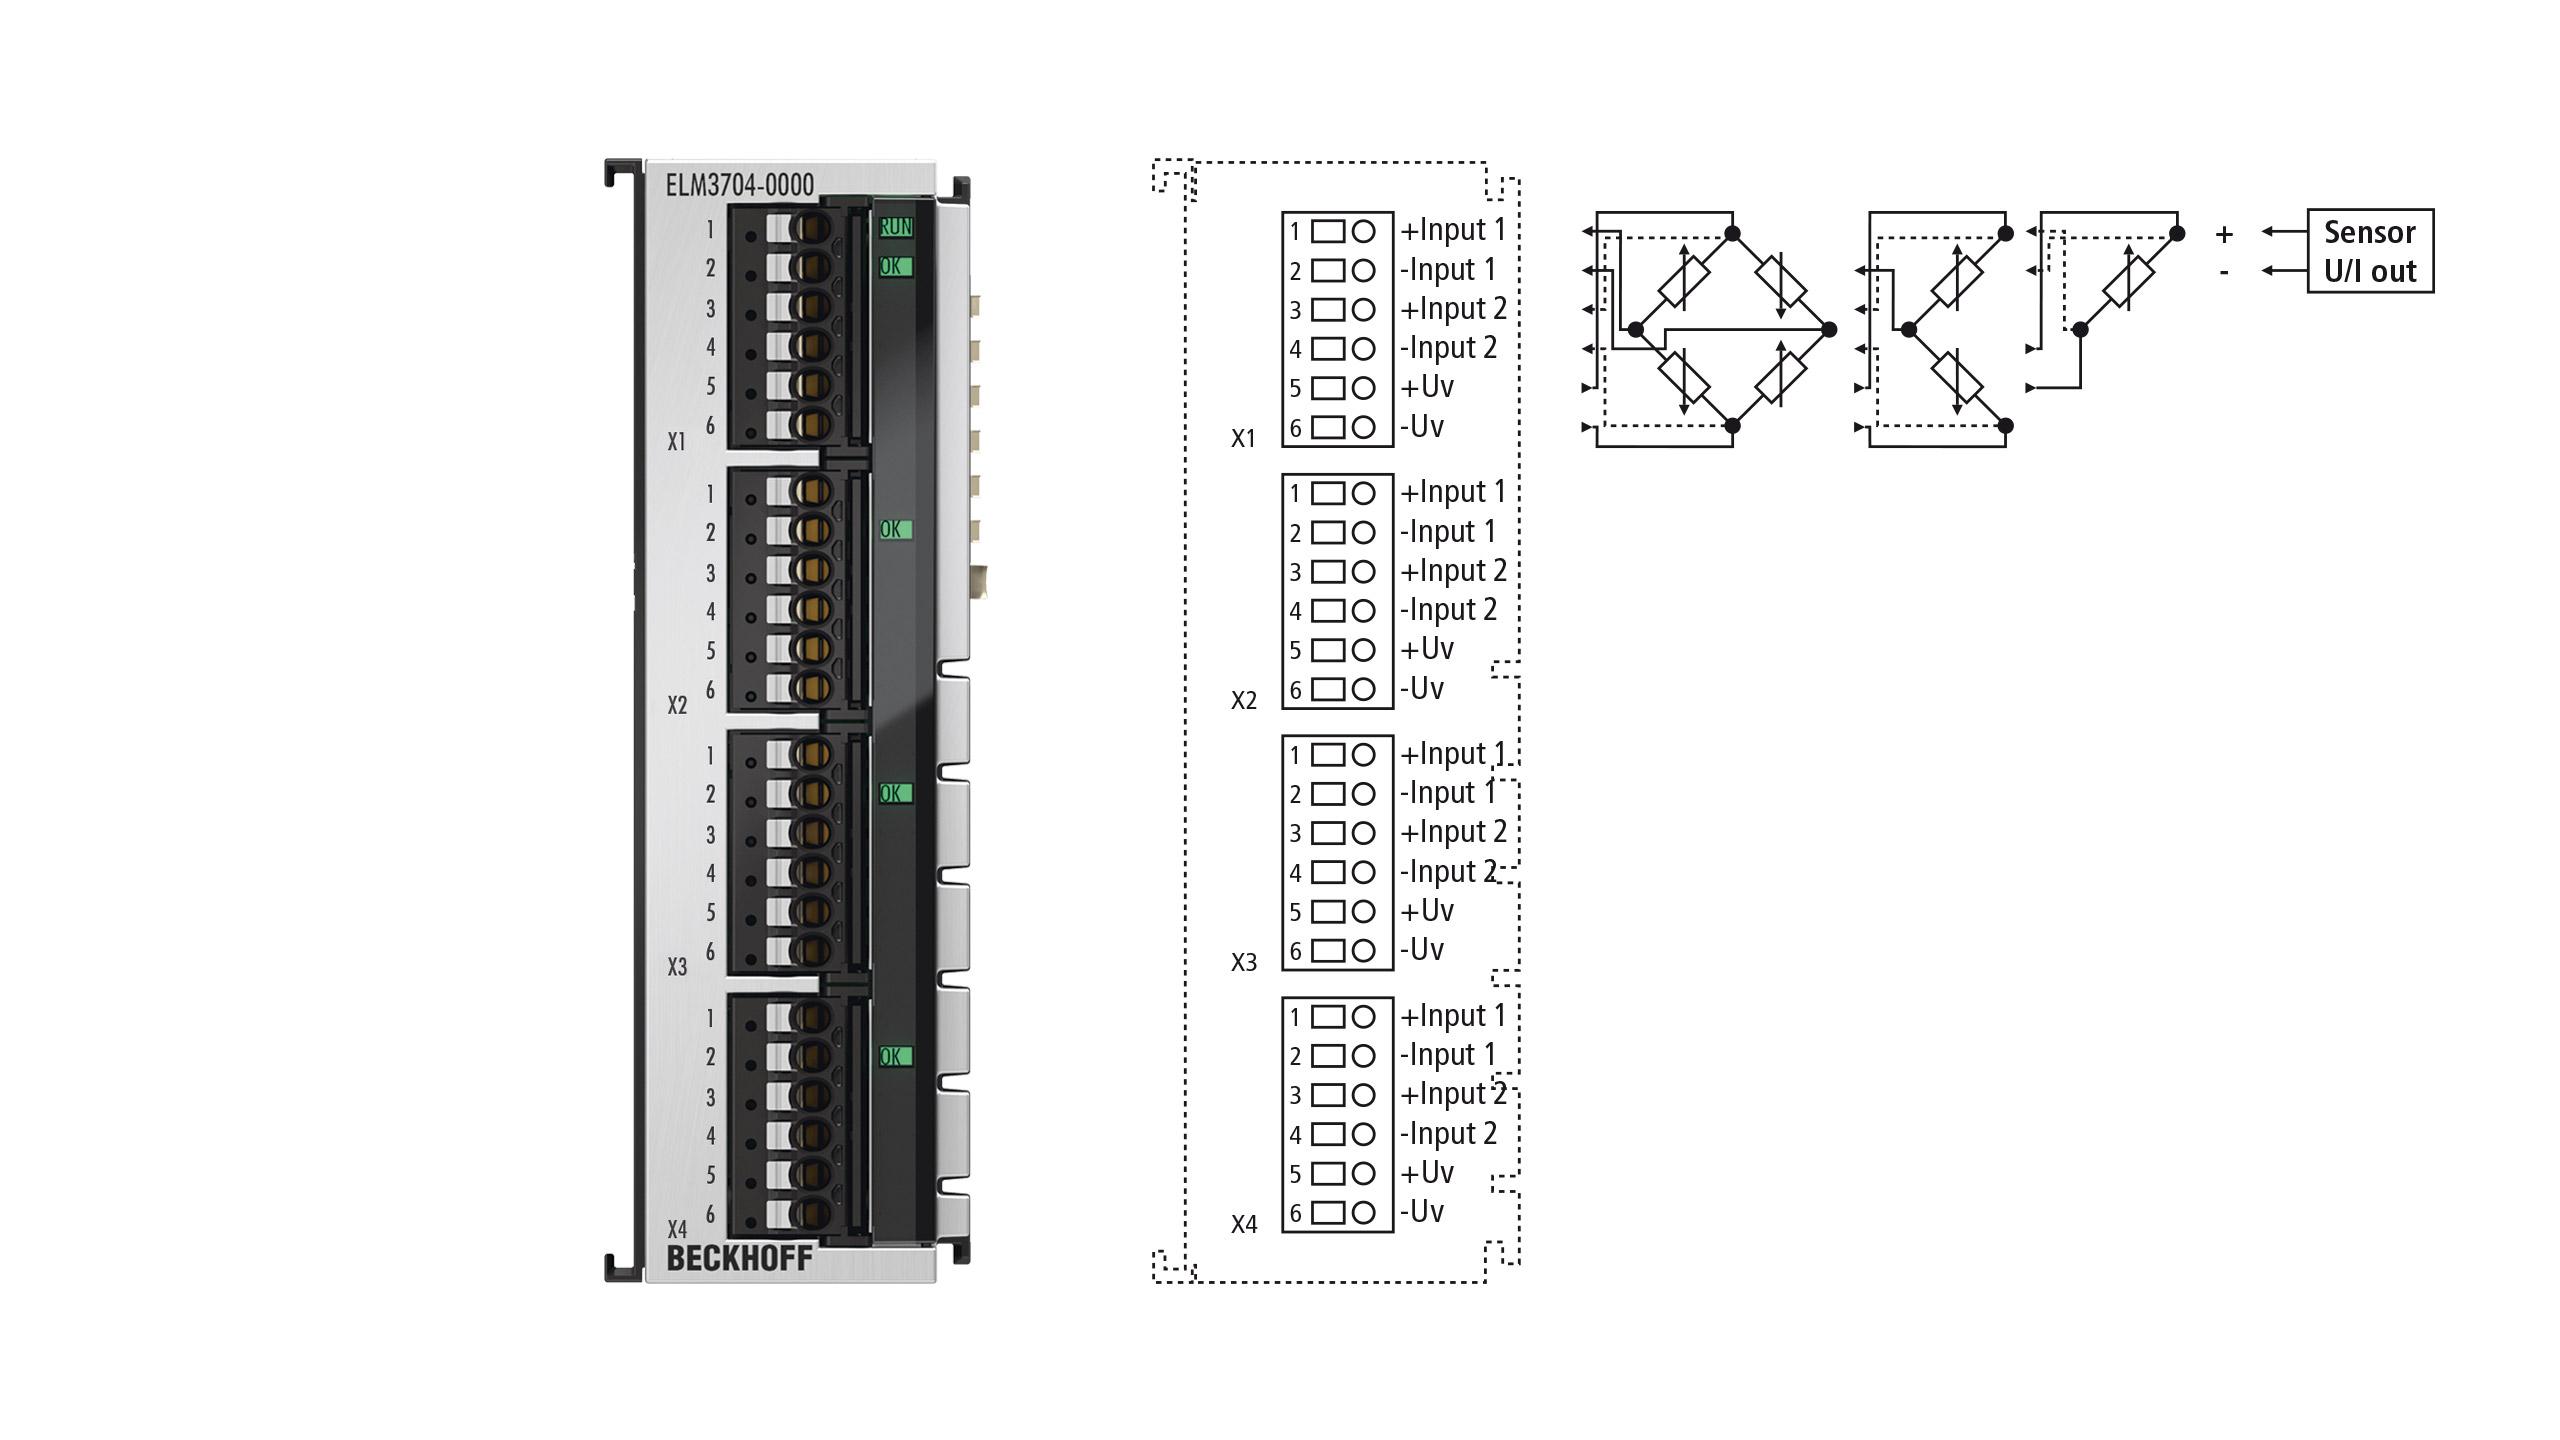 ELM3704-0000 | 4-channel multi-functional input, 24bit, 10ksps